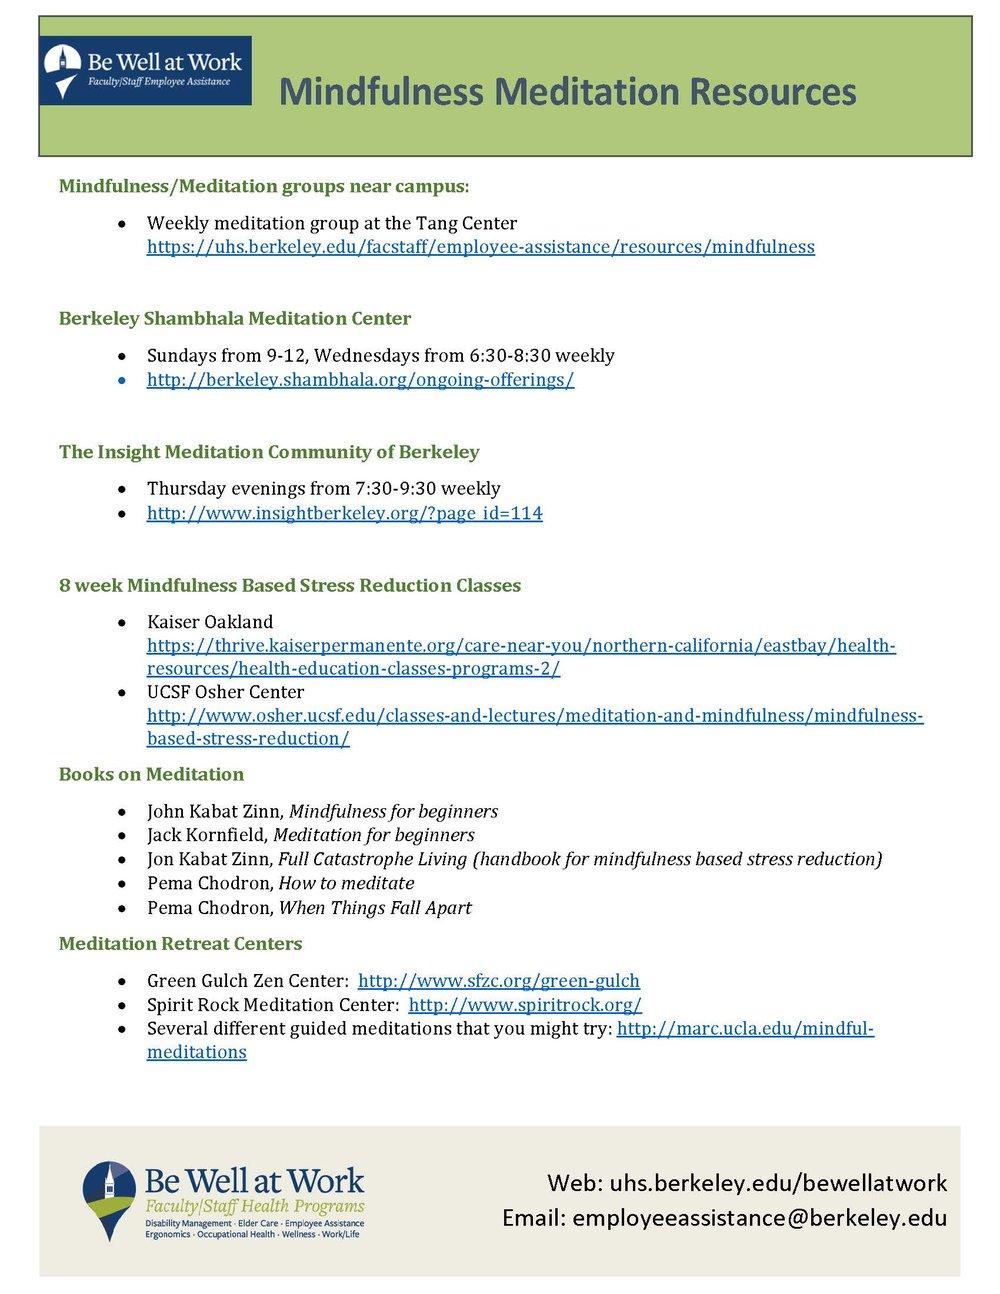 UC Mindfulness Meditation Resources_Page_1.jpg